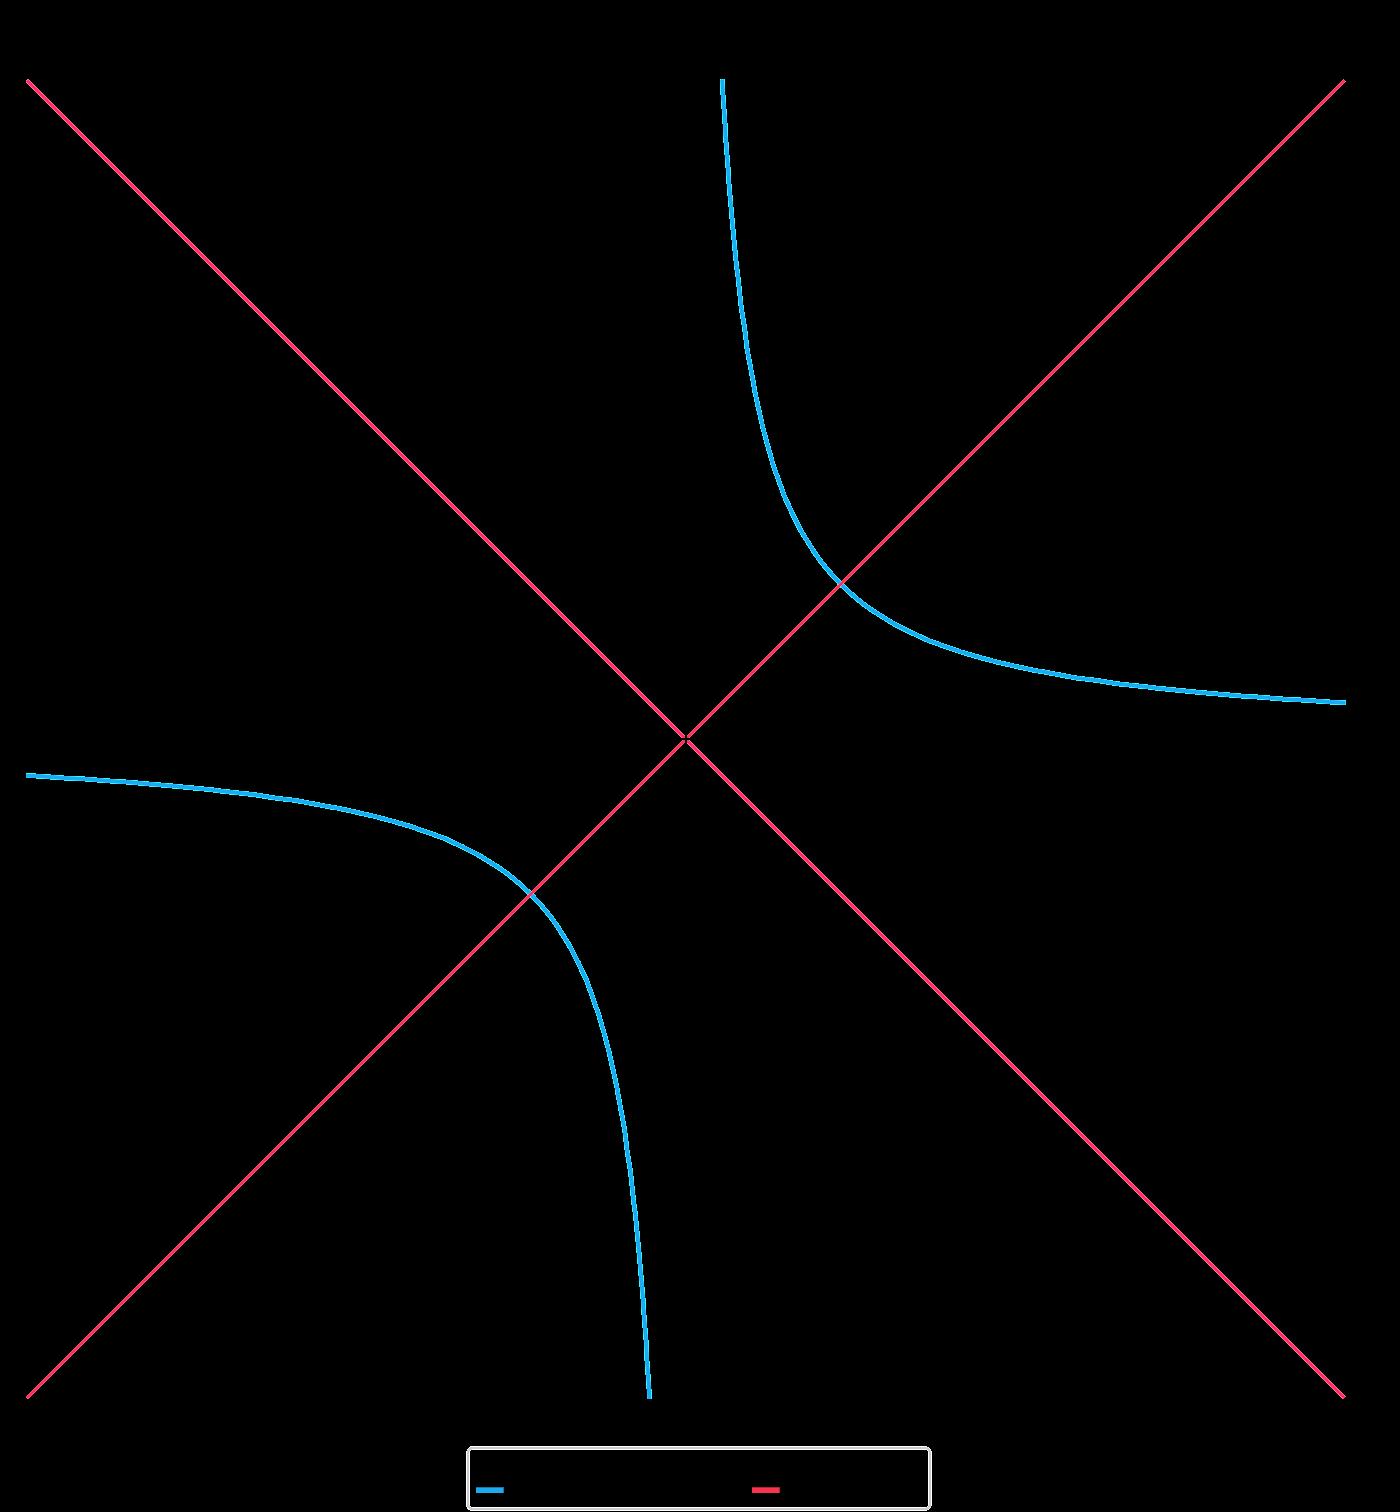 Studenti/matematica